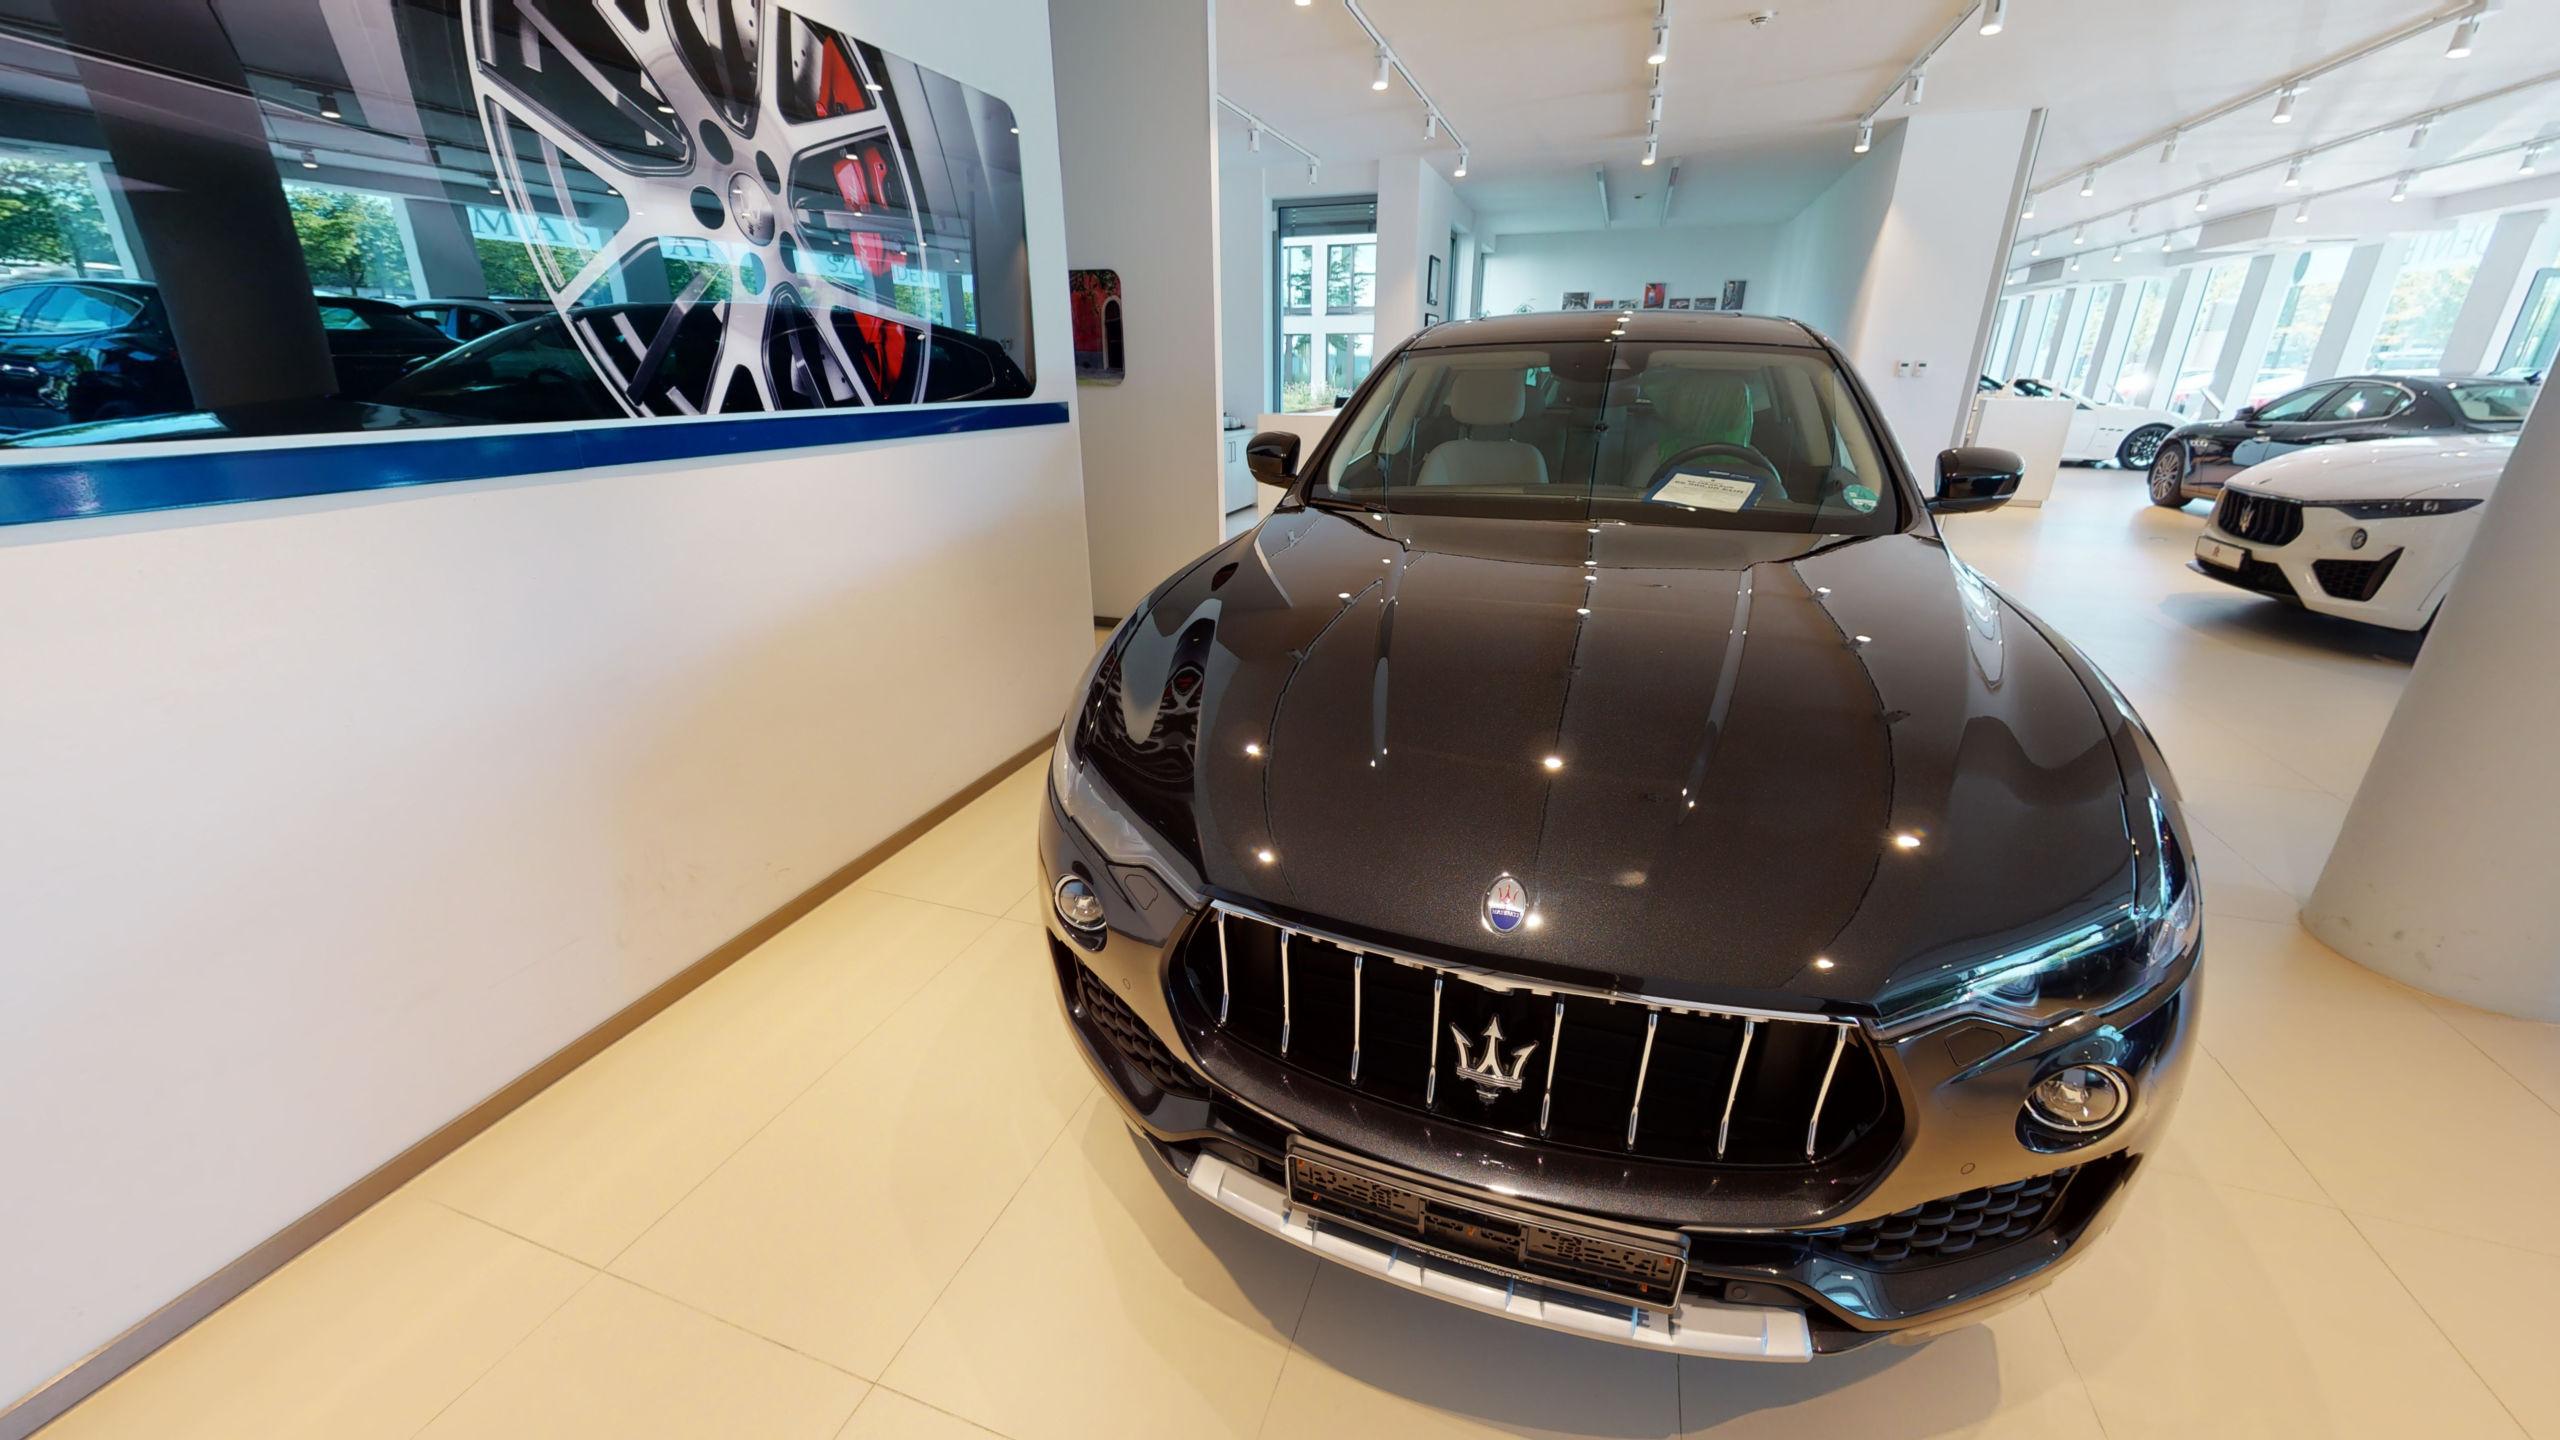 Maserati München Virtual Tour by Google Street View | 360INT